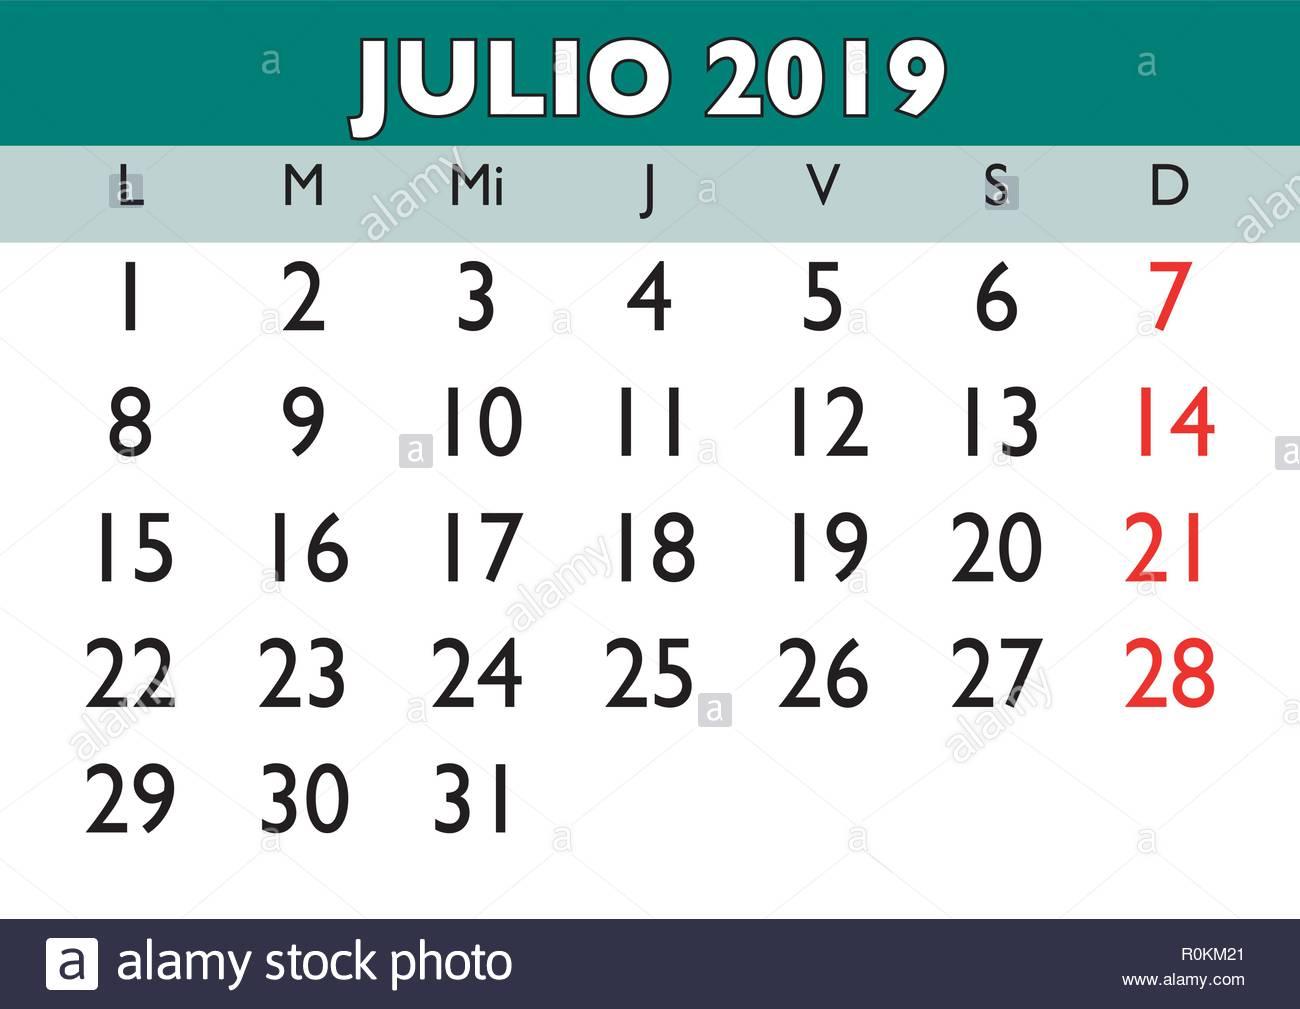 Julio Calendario.July Month In A Year 2019 Wall Calendar In Spanish Julio 2019